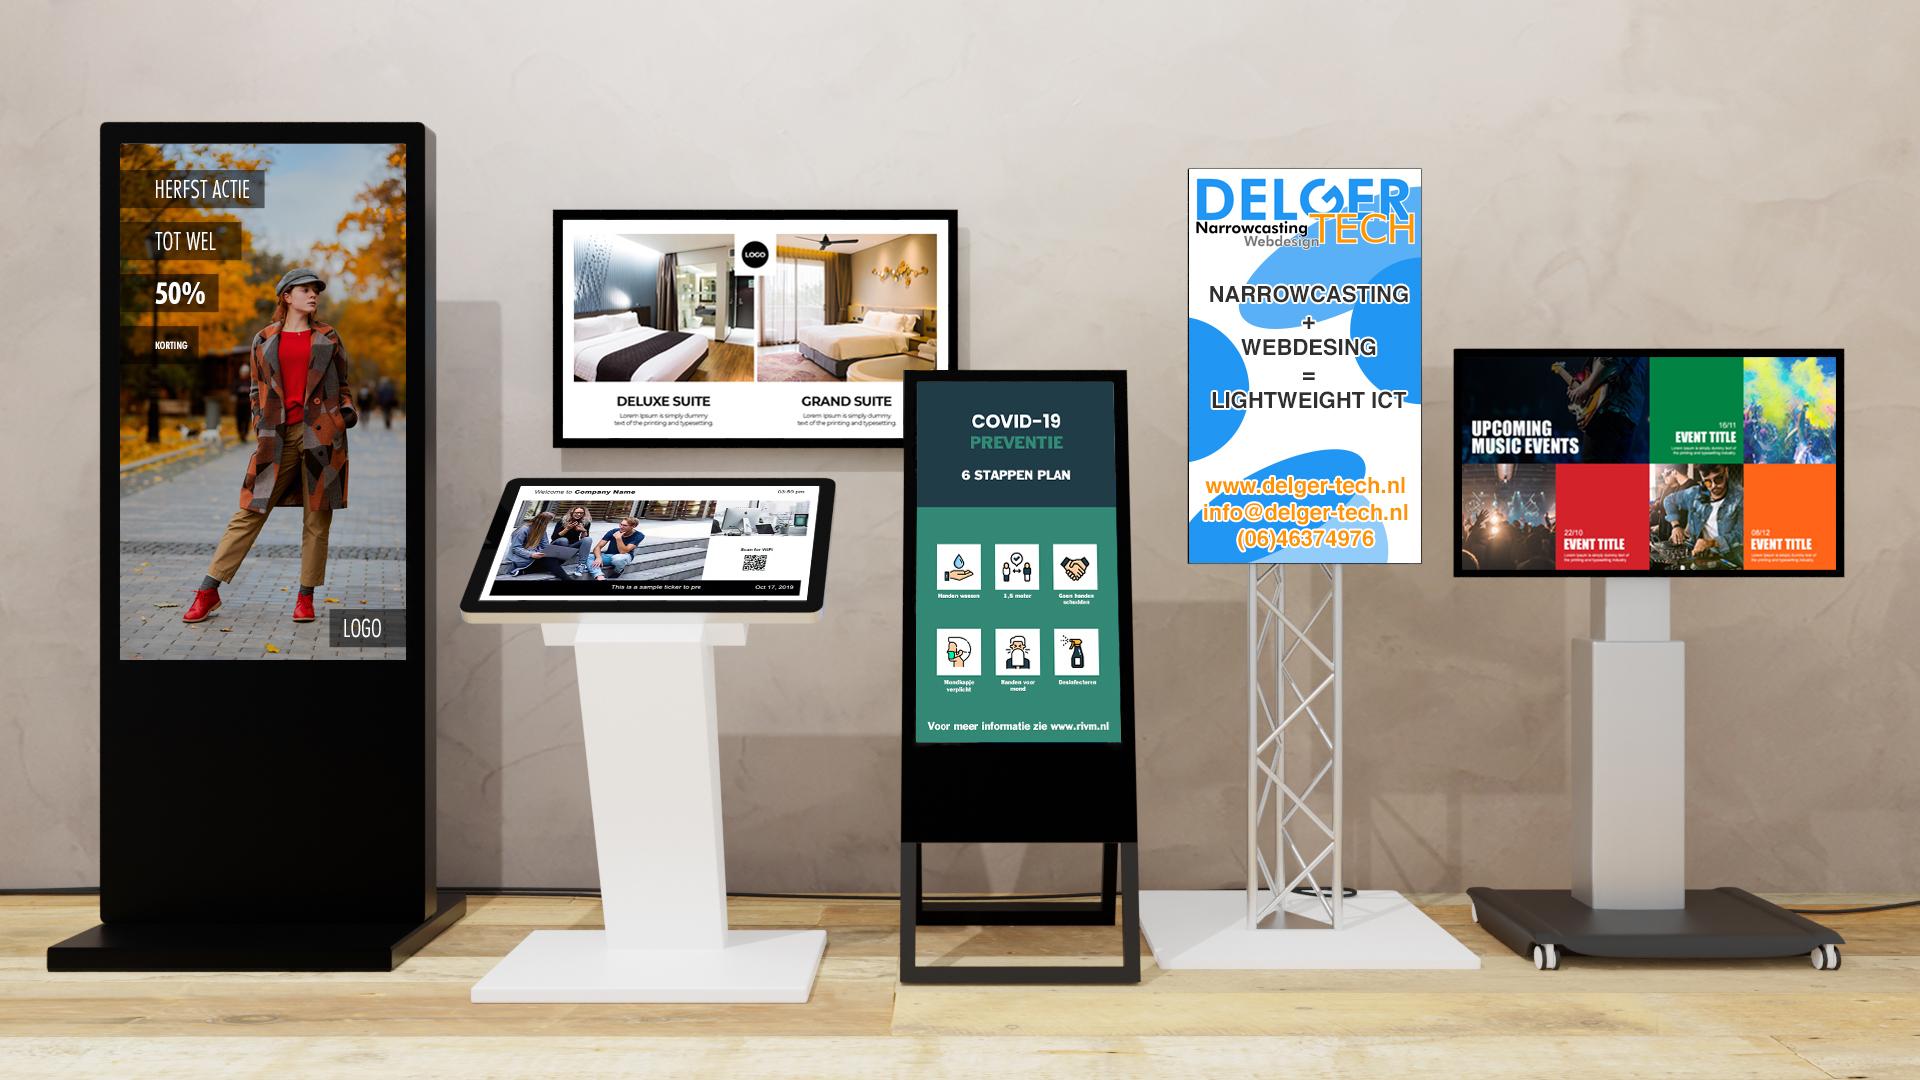 narrowcasting is digital signage ePoster kiosk truss trolly stoepbord